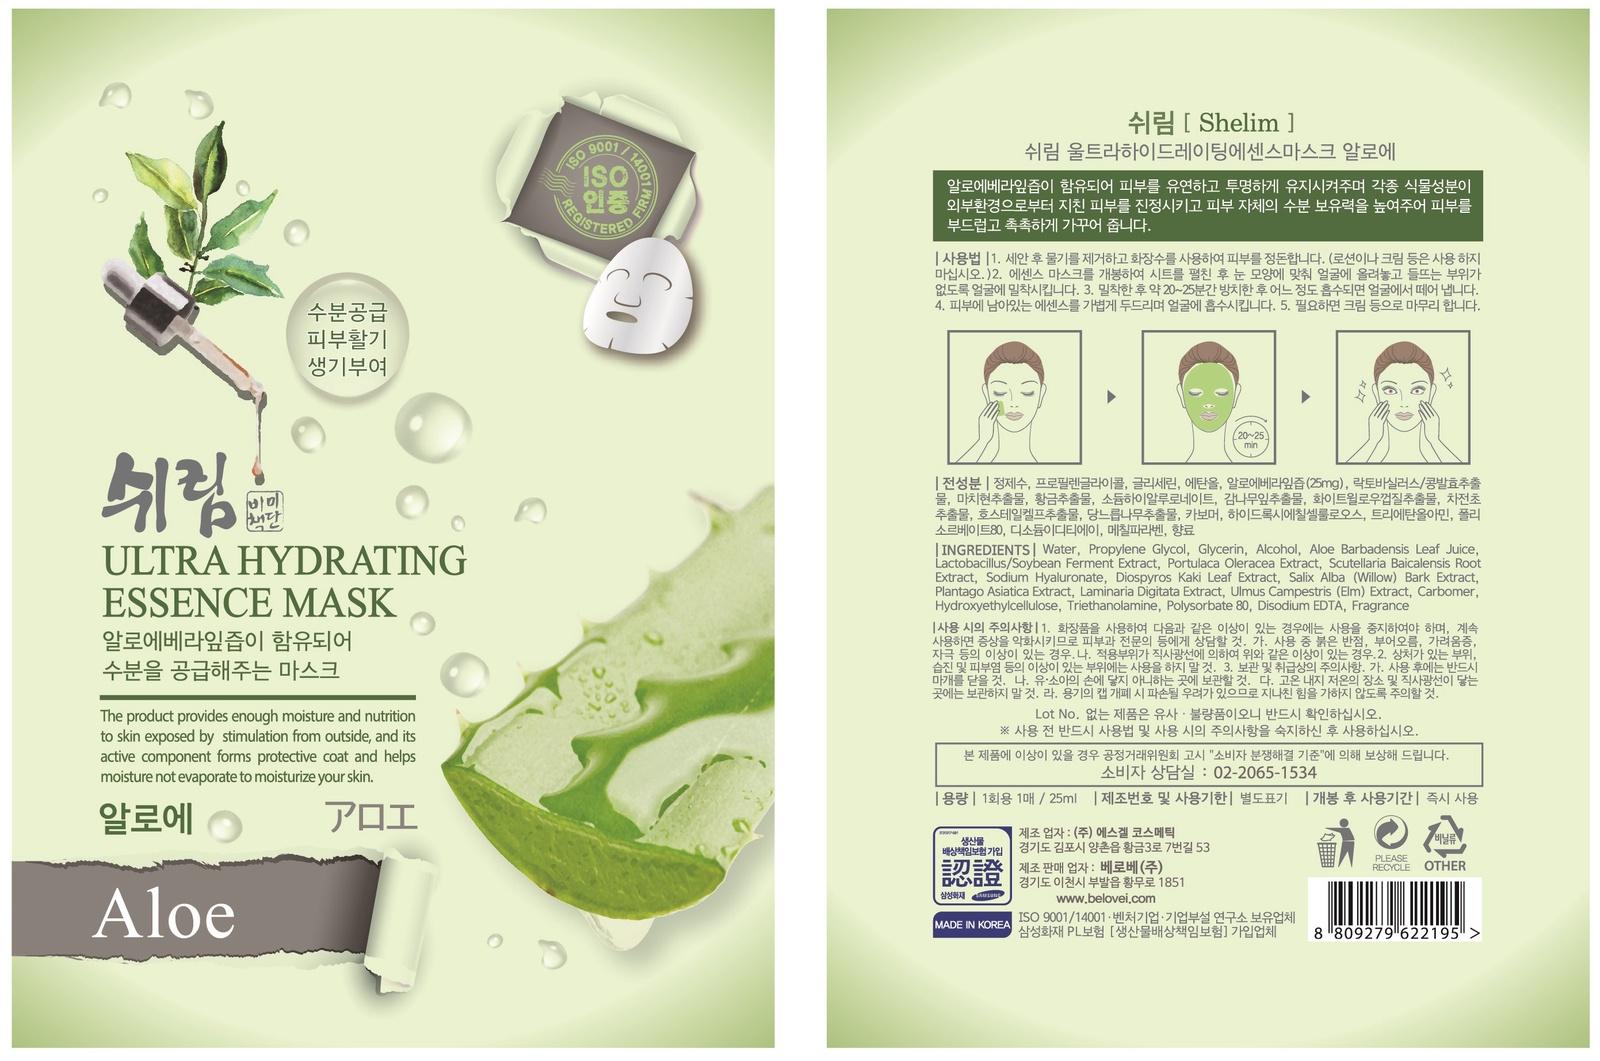 Shelim,Увлажняющая тканевая маска  с натуральным экстрактом алоэ, 25мл.